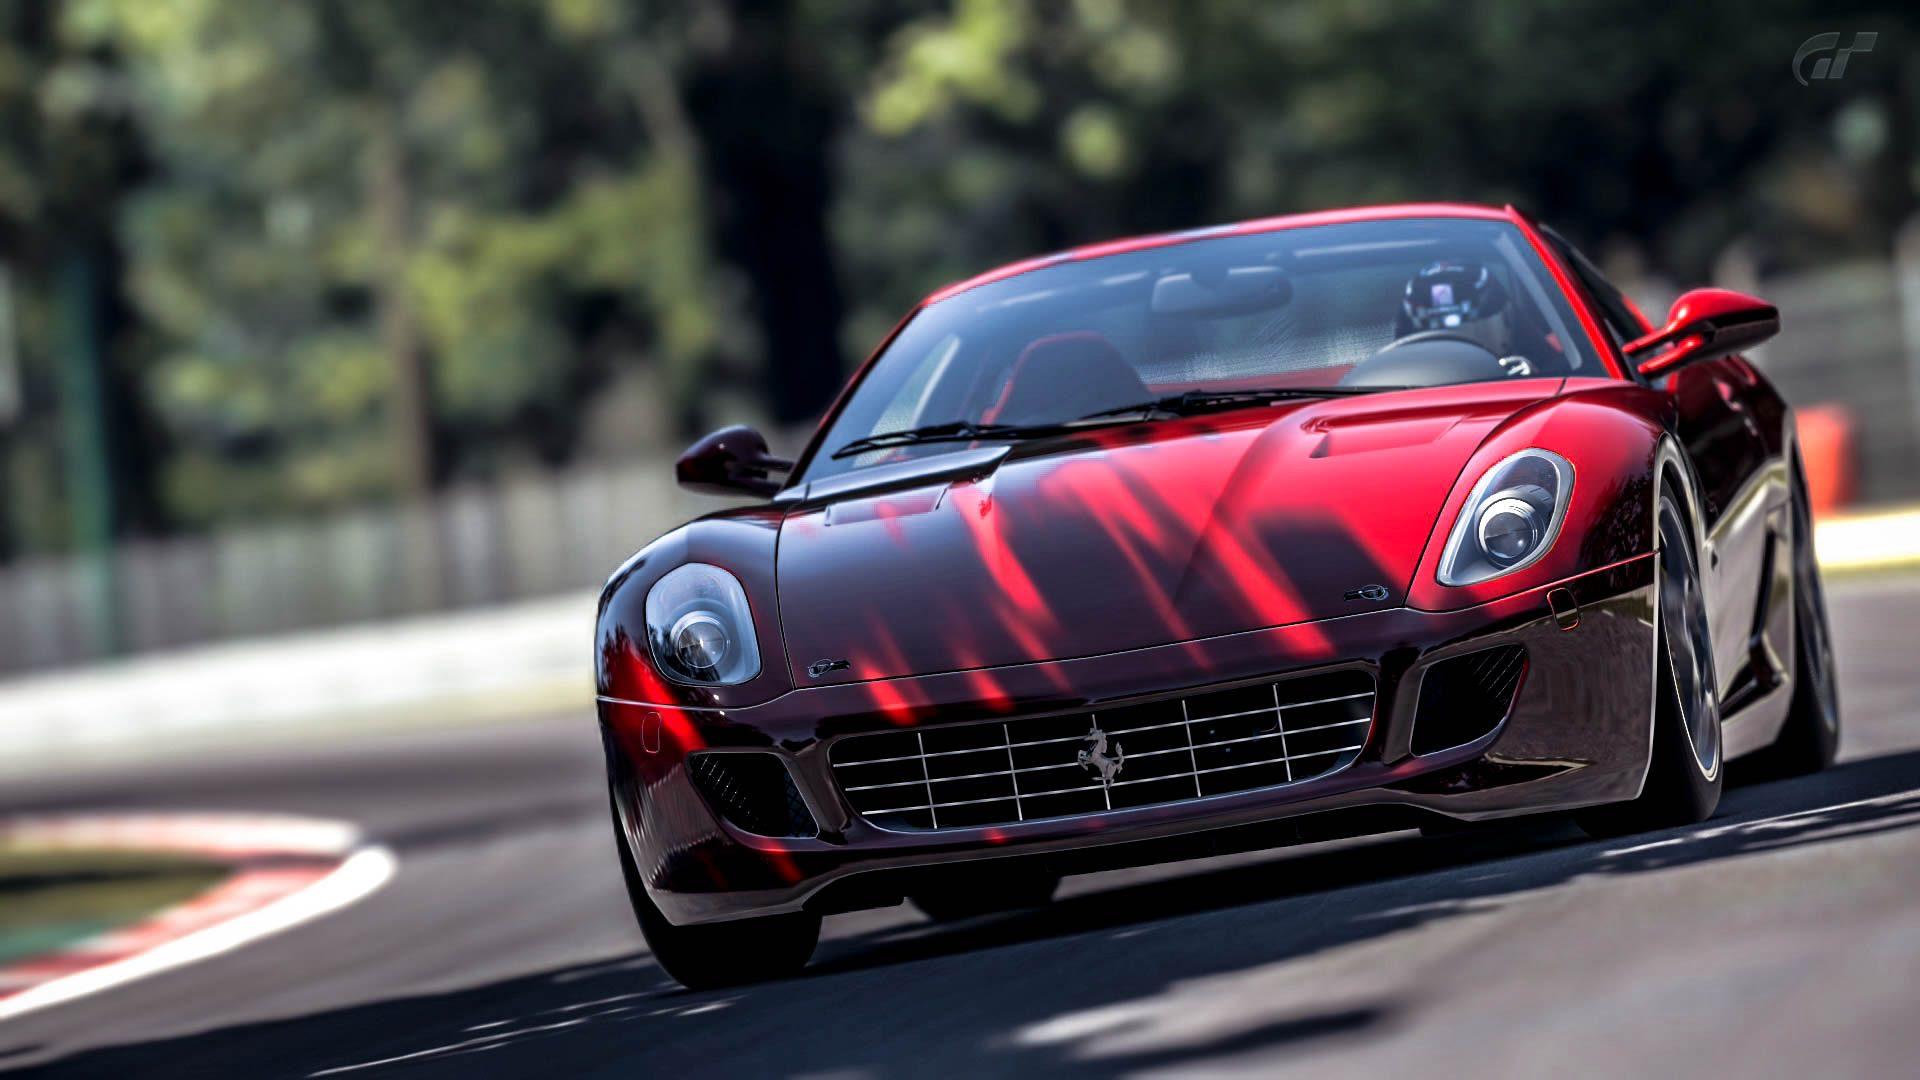 Ferrari_599_11.jpg